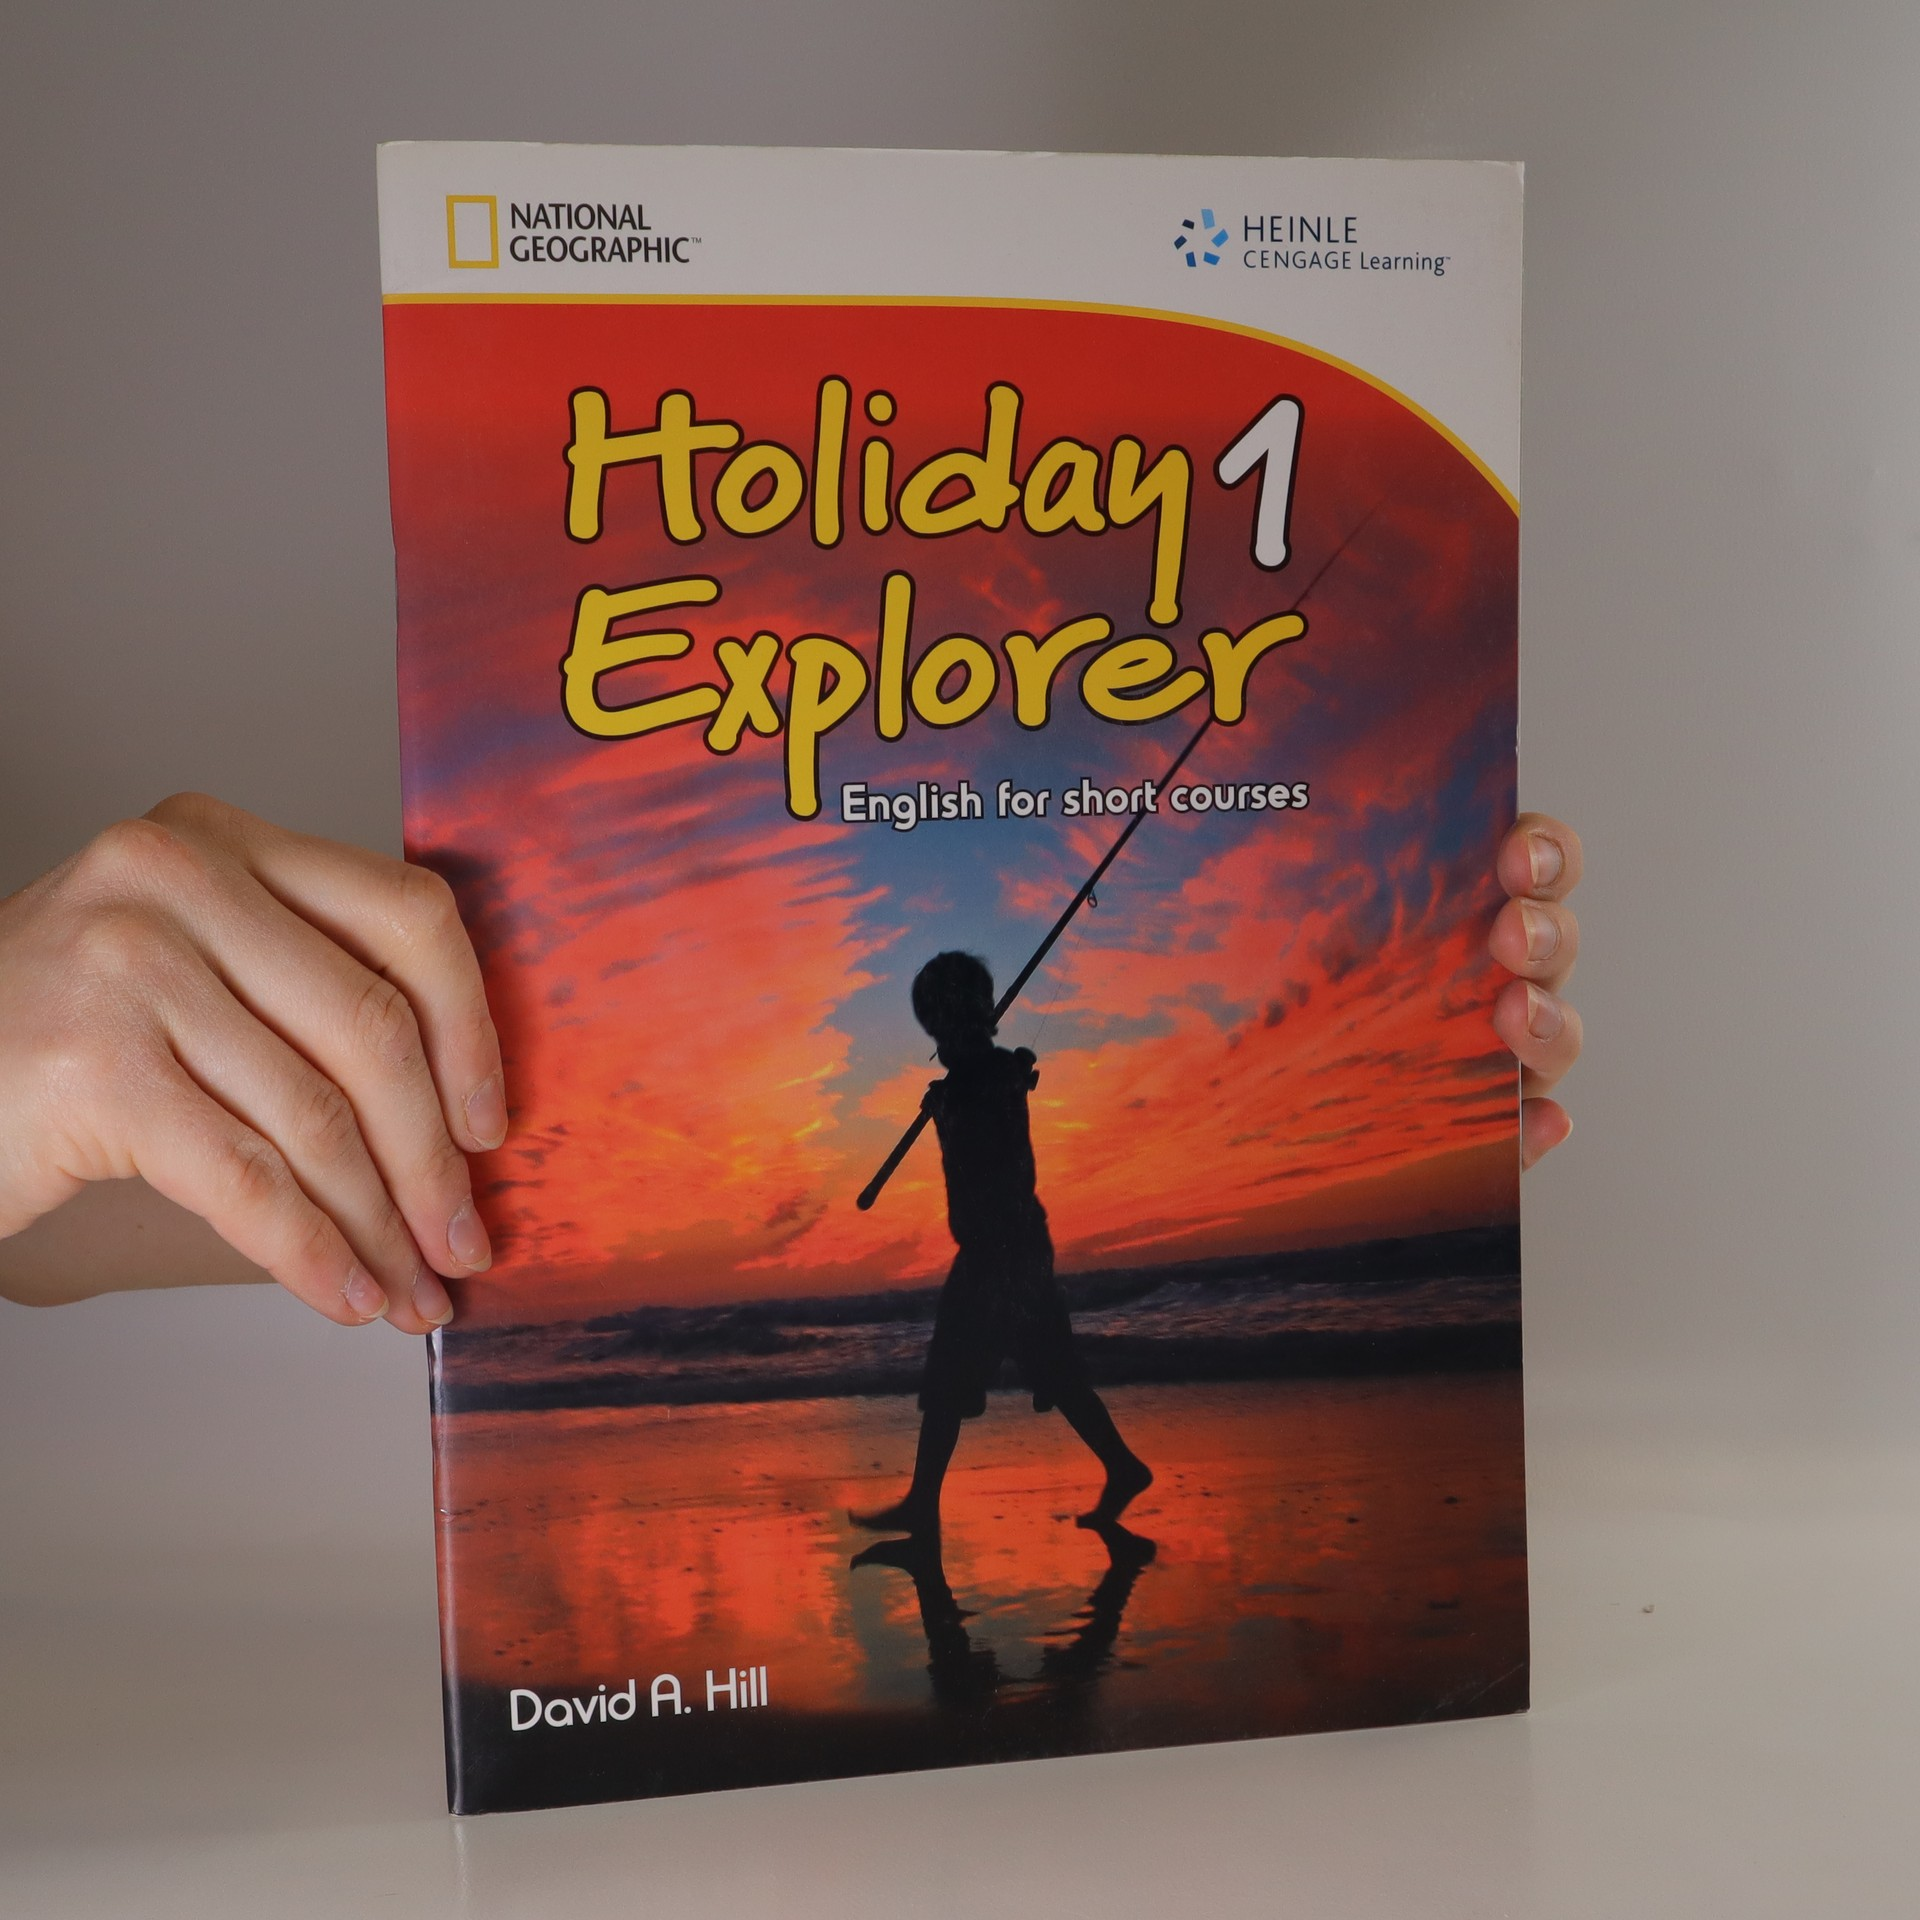 antikvární kniha Holiday Explorer 1. English for short courses, 2011